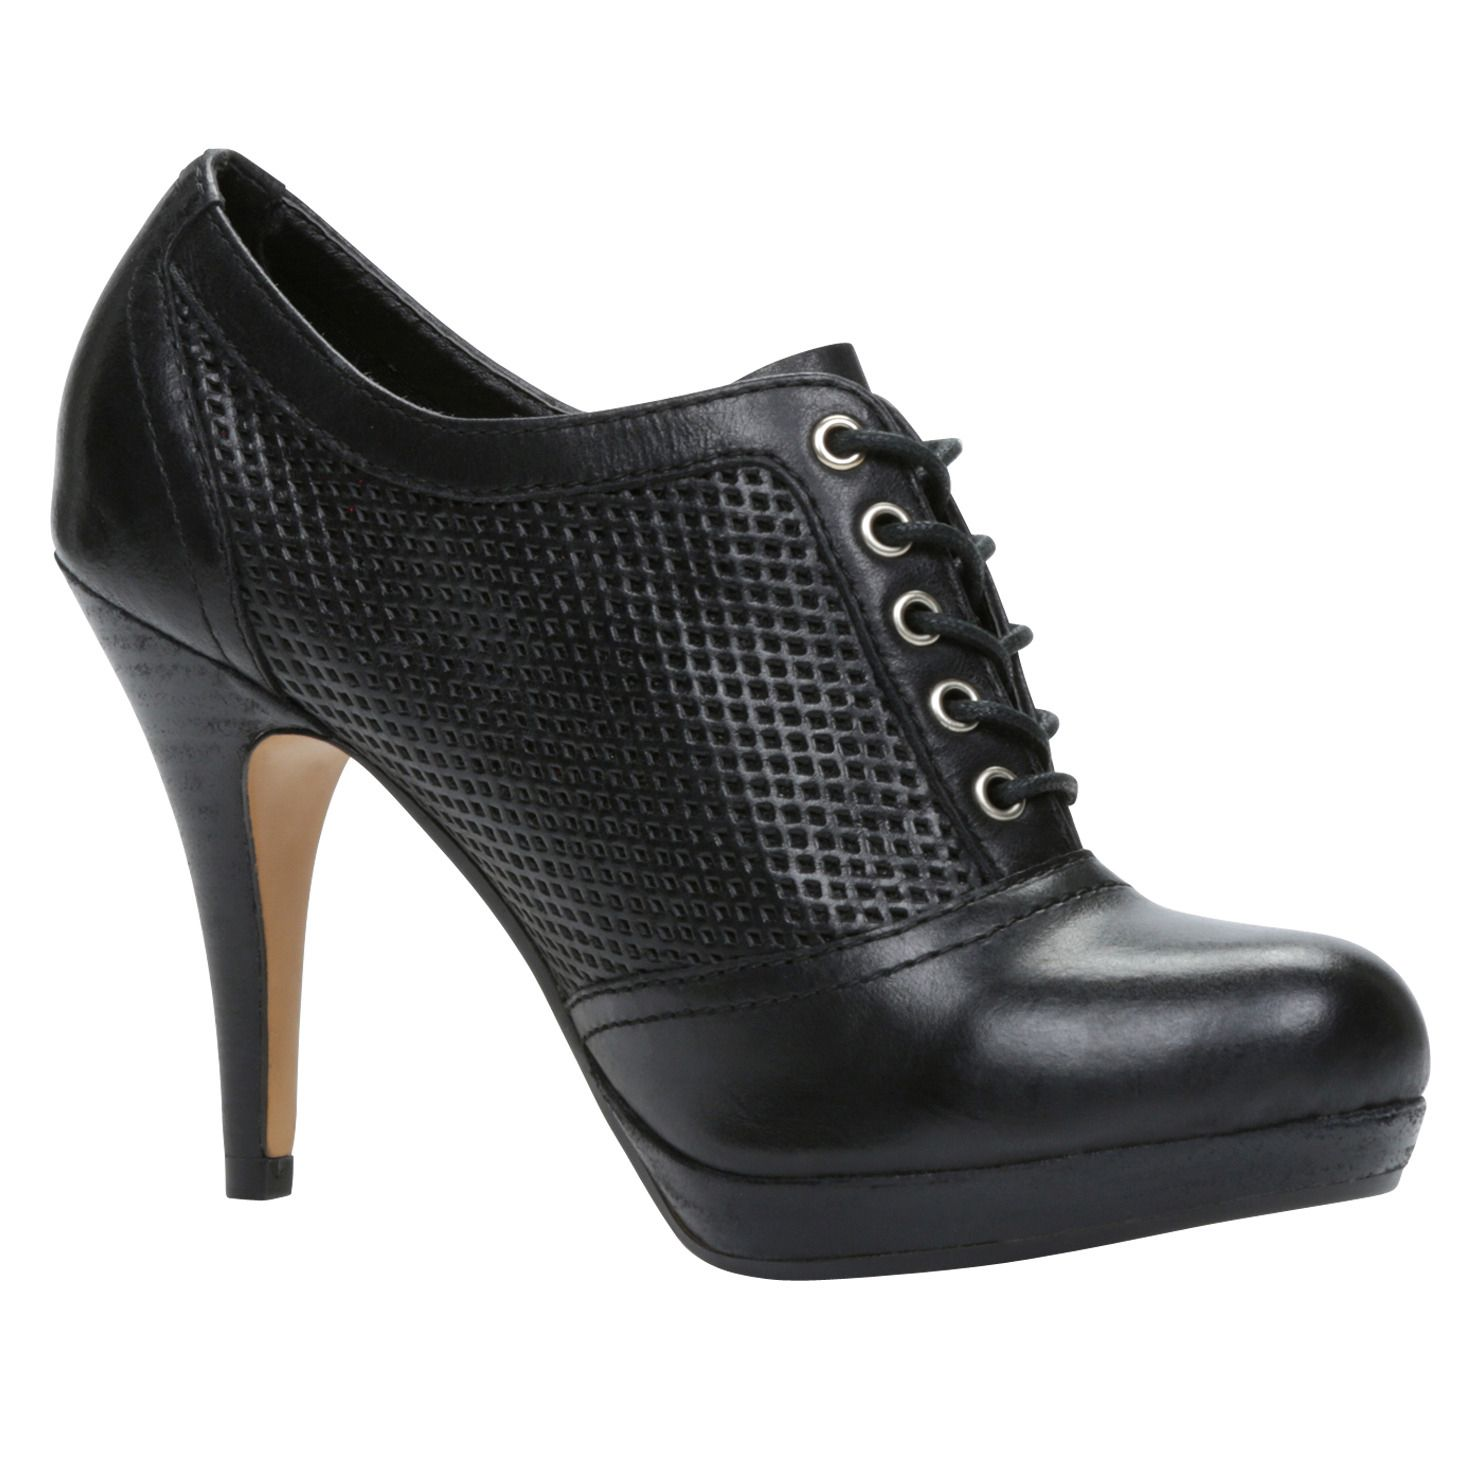 ALDO black high heels.